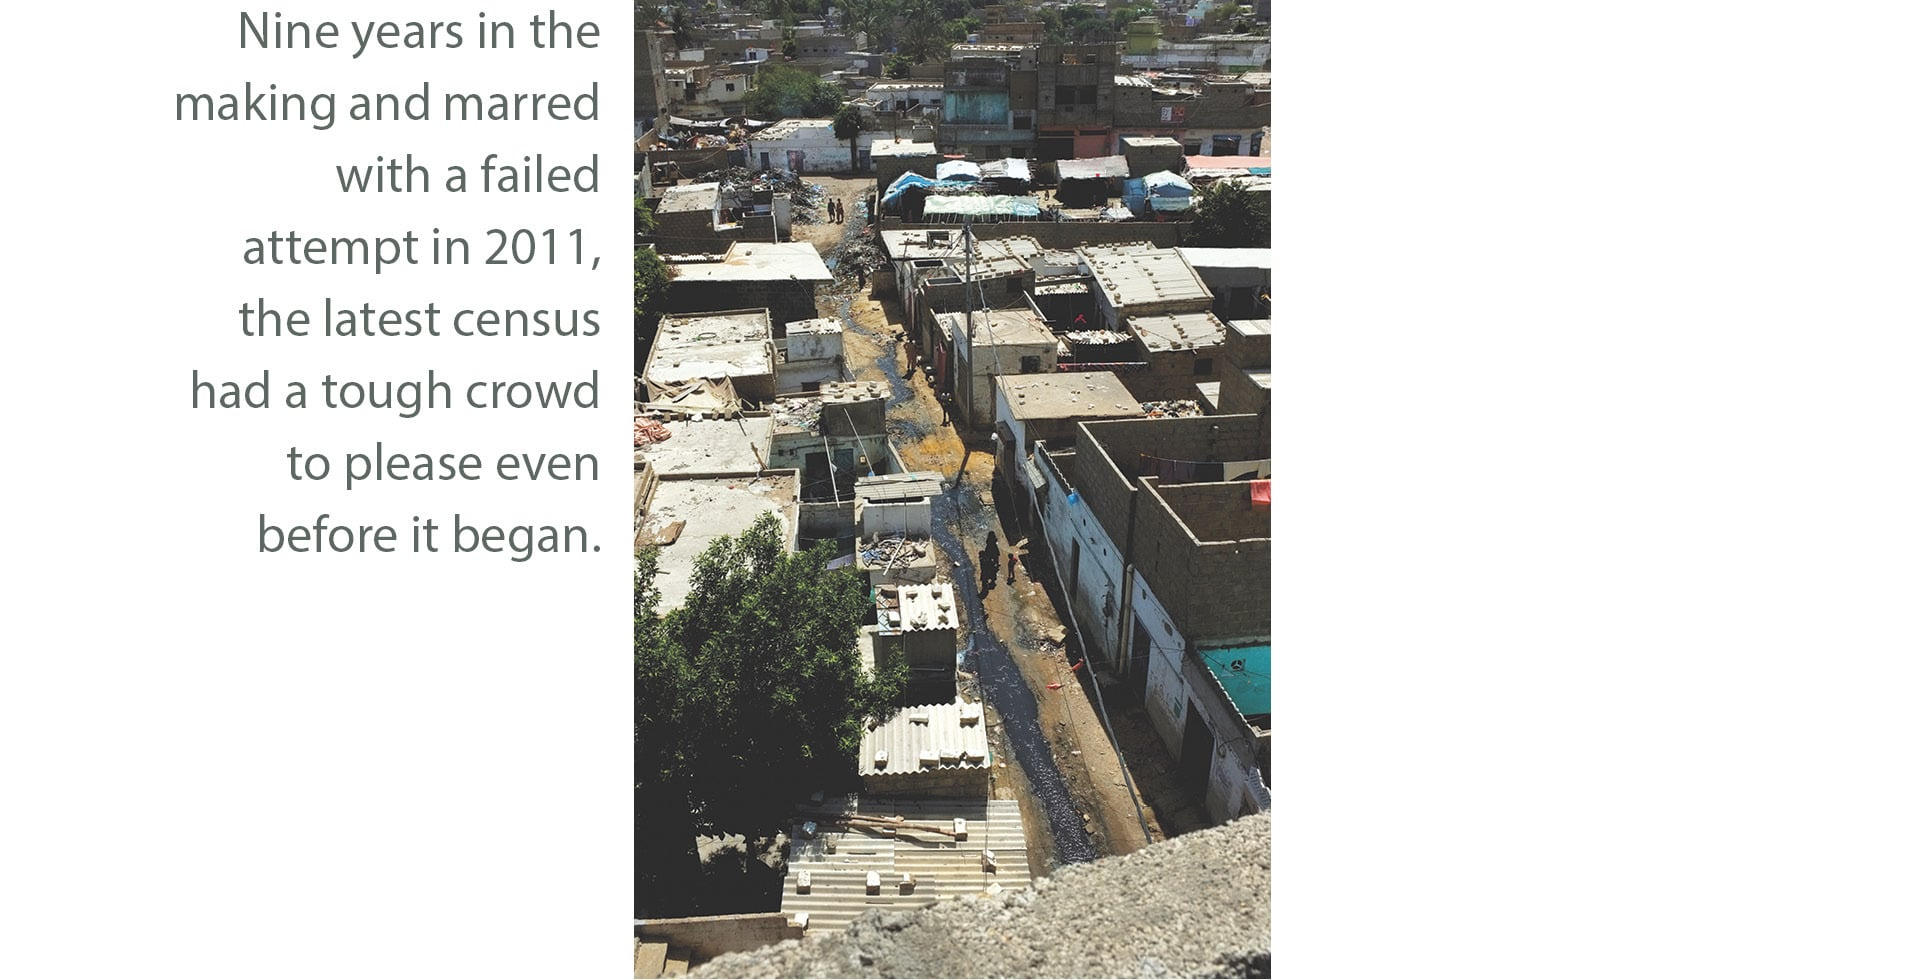 Houses in Baloch Goth, Karachi | Malika Abbas, White Star